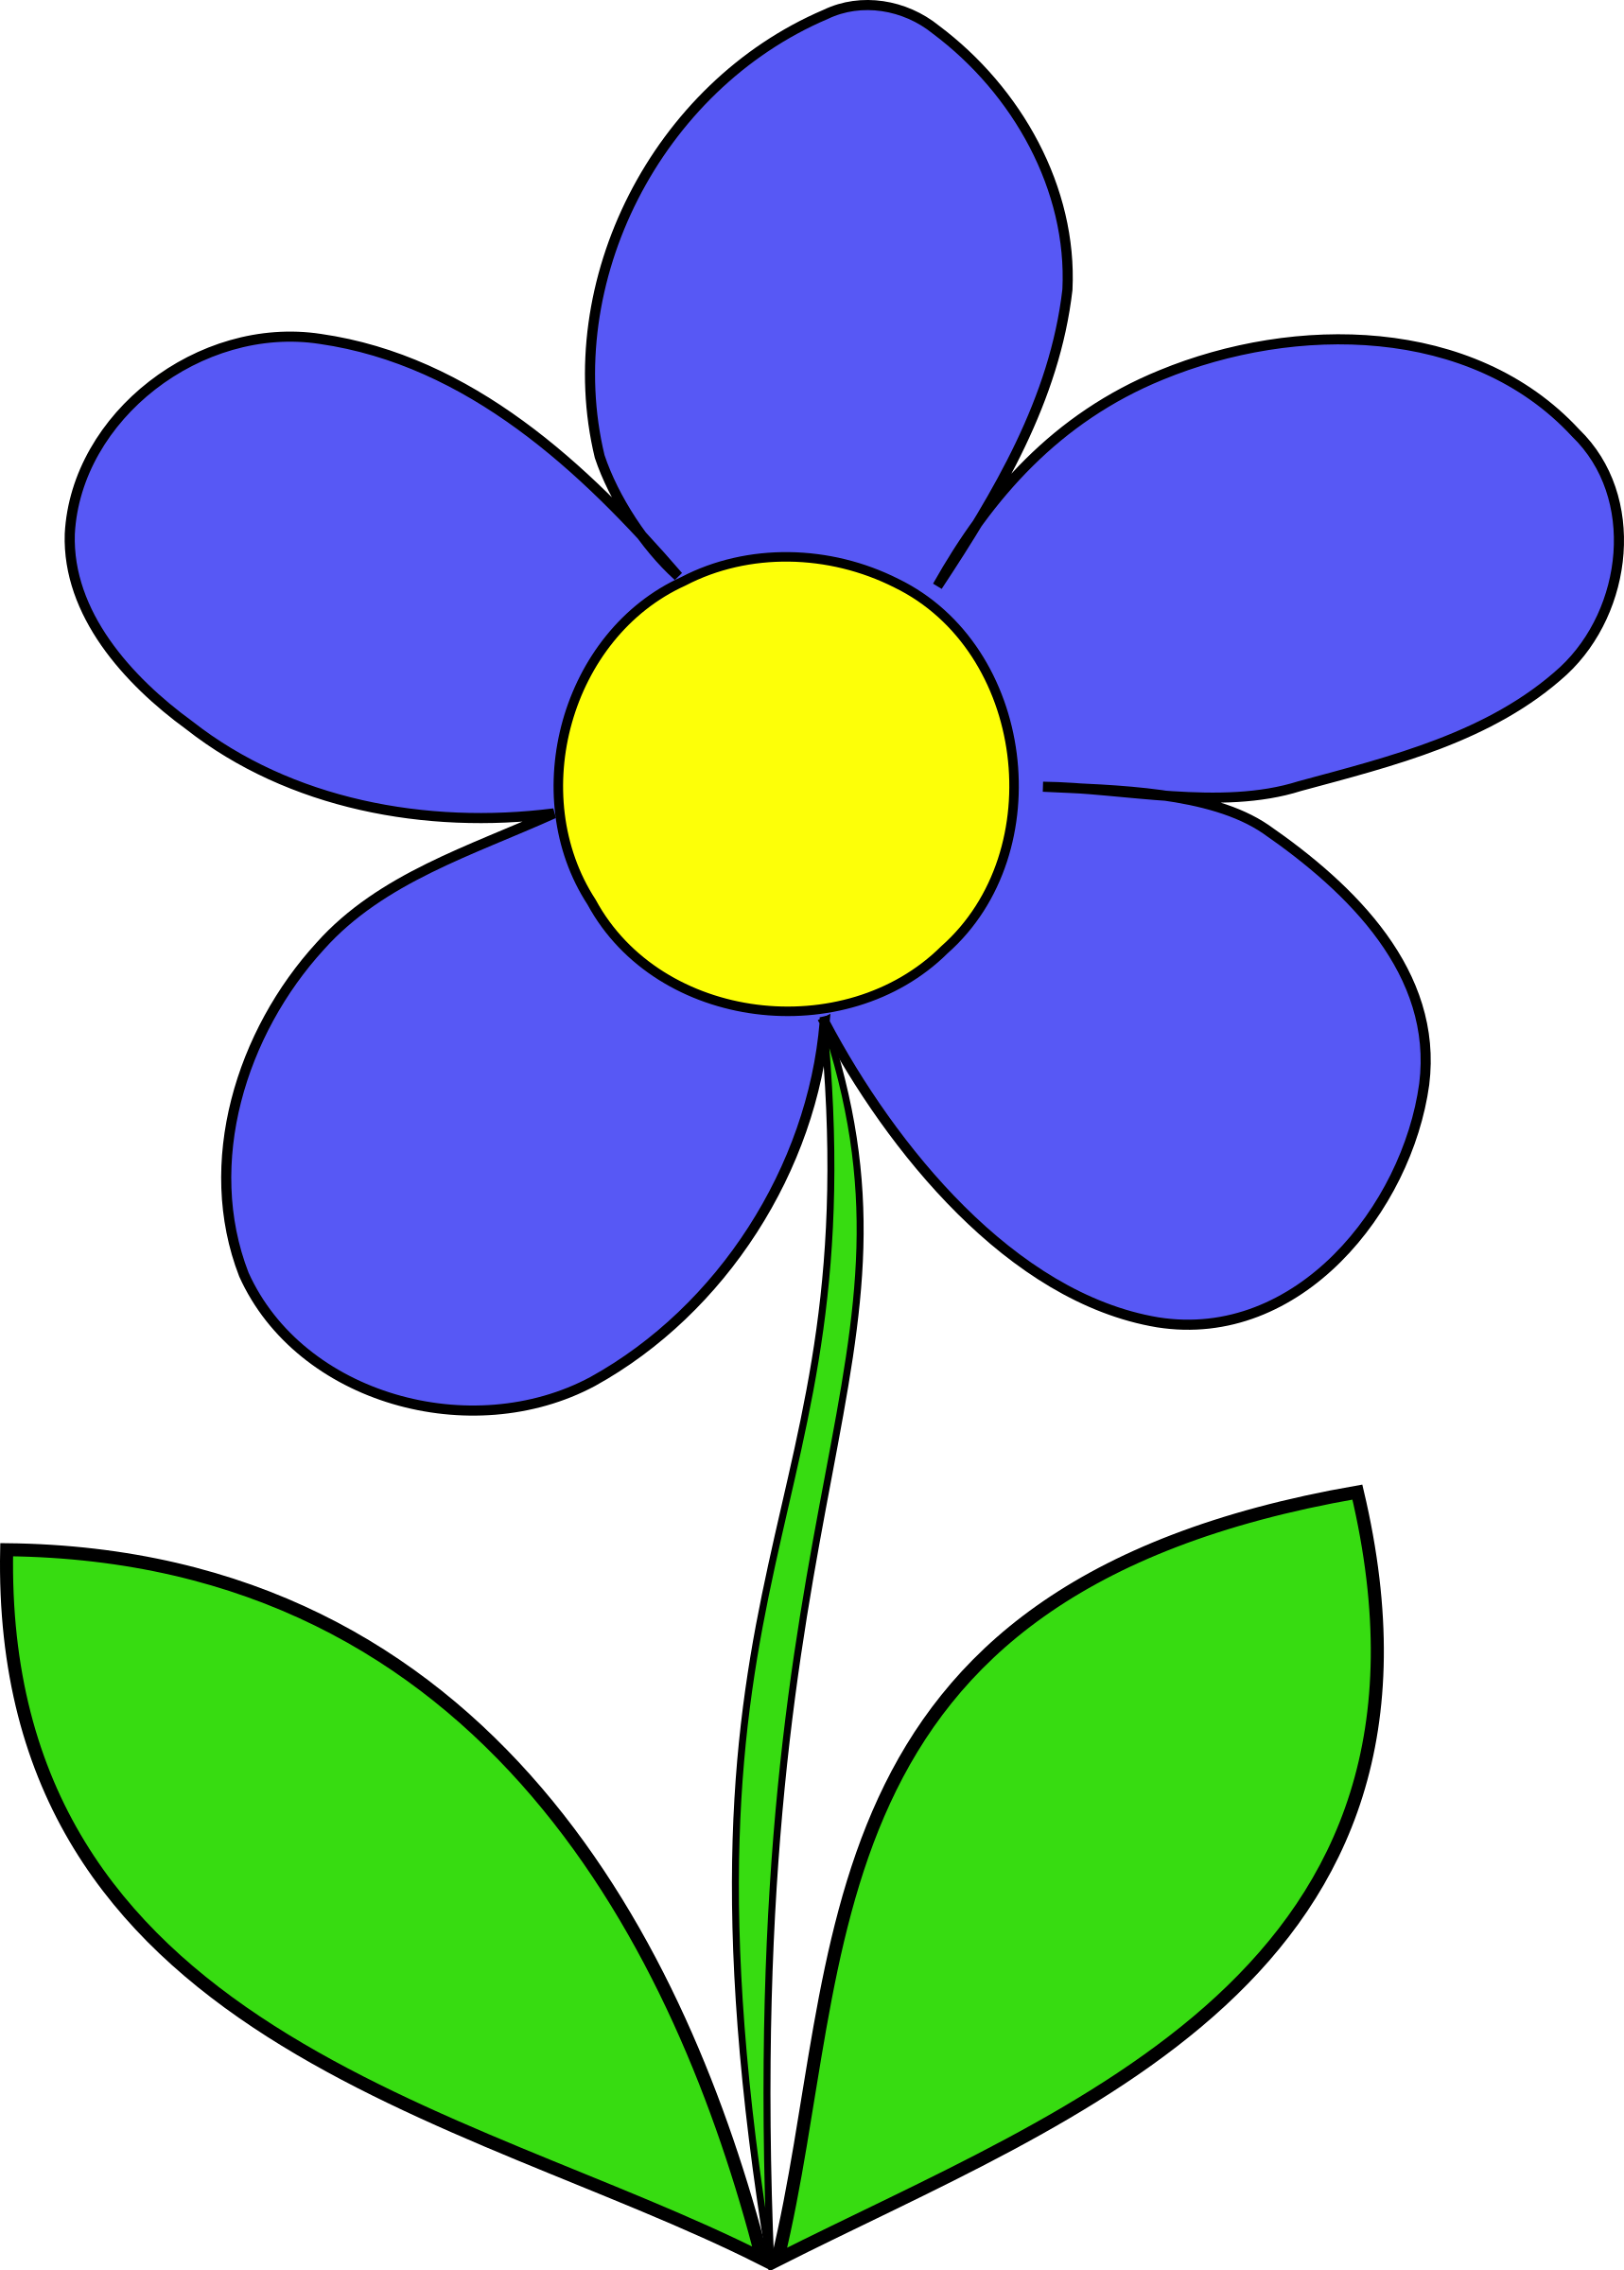 Simple Flower Part - 20: BIG IMAGE (PNG)